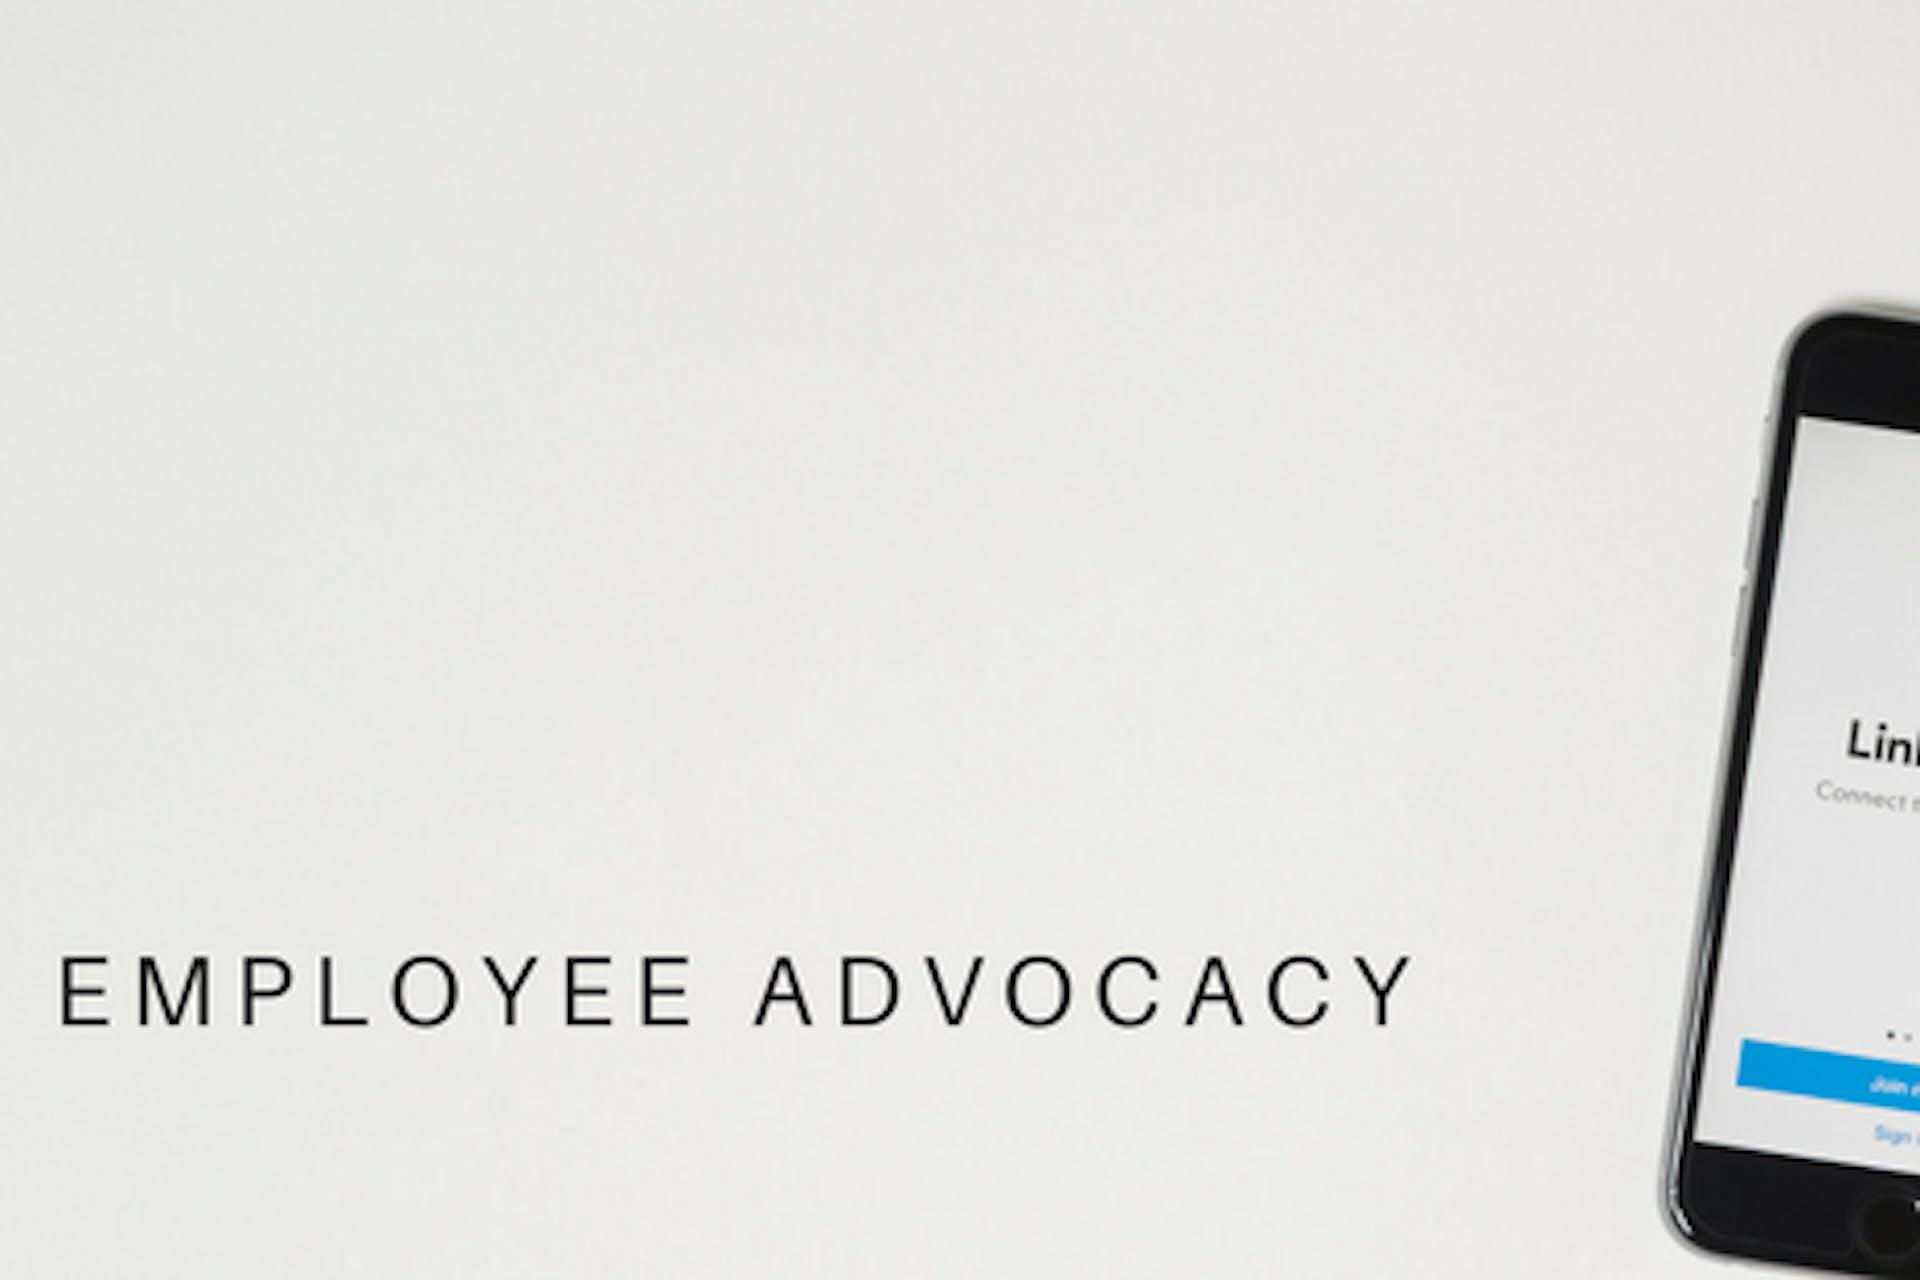 Employee Advocacy LinkedIn Smartphone